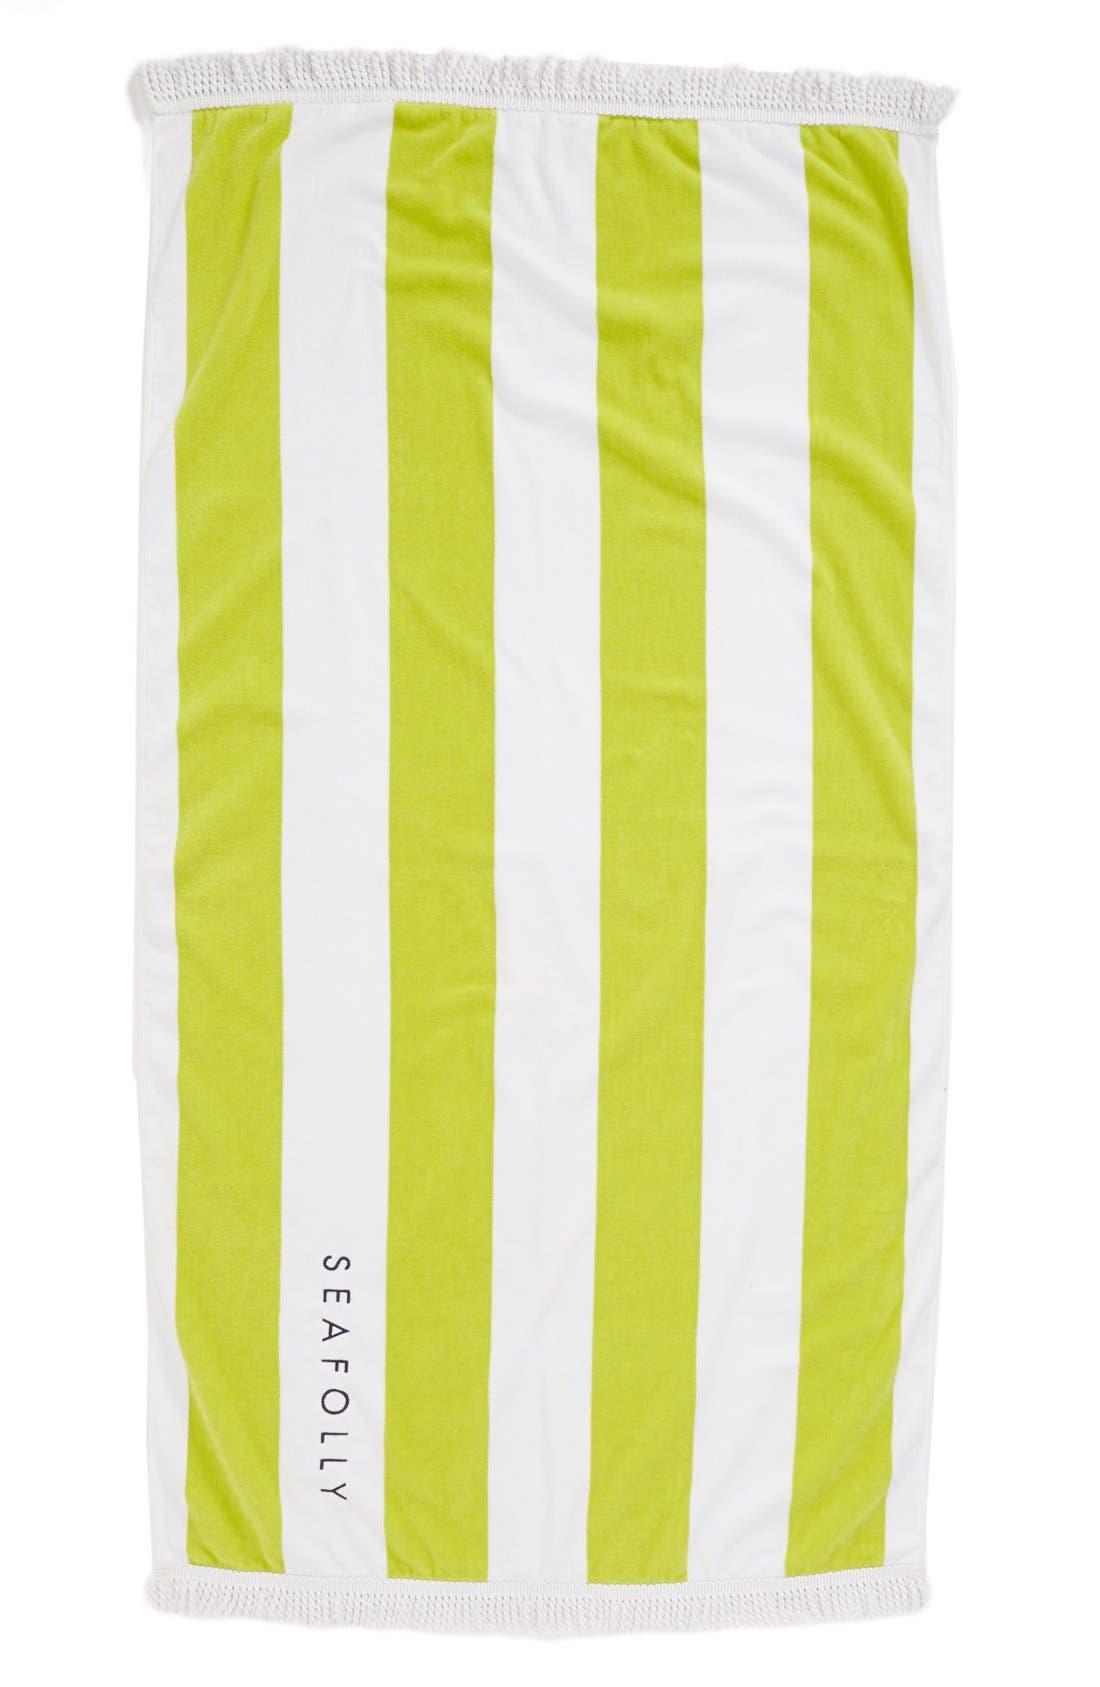 Alternate Image 1 Selected - Seafolly 'Splash' Velour & Terry Towel